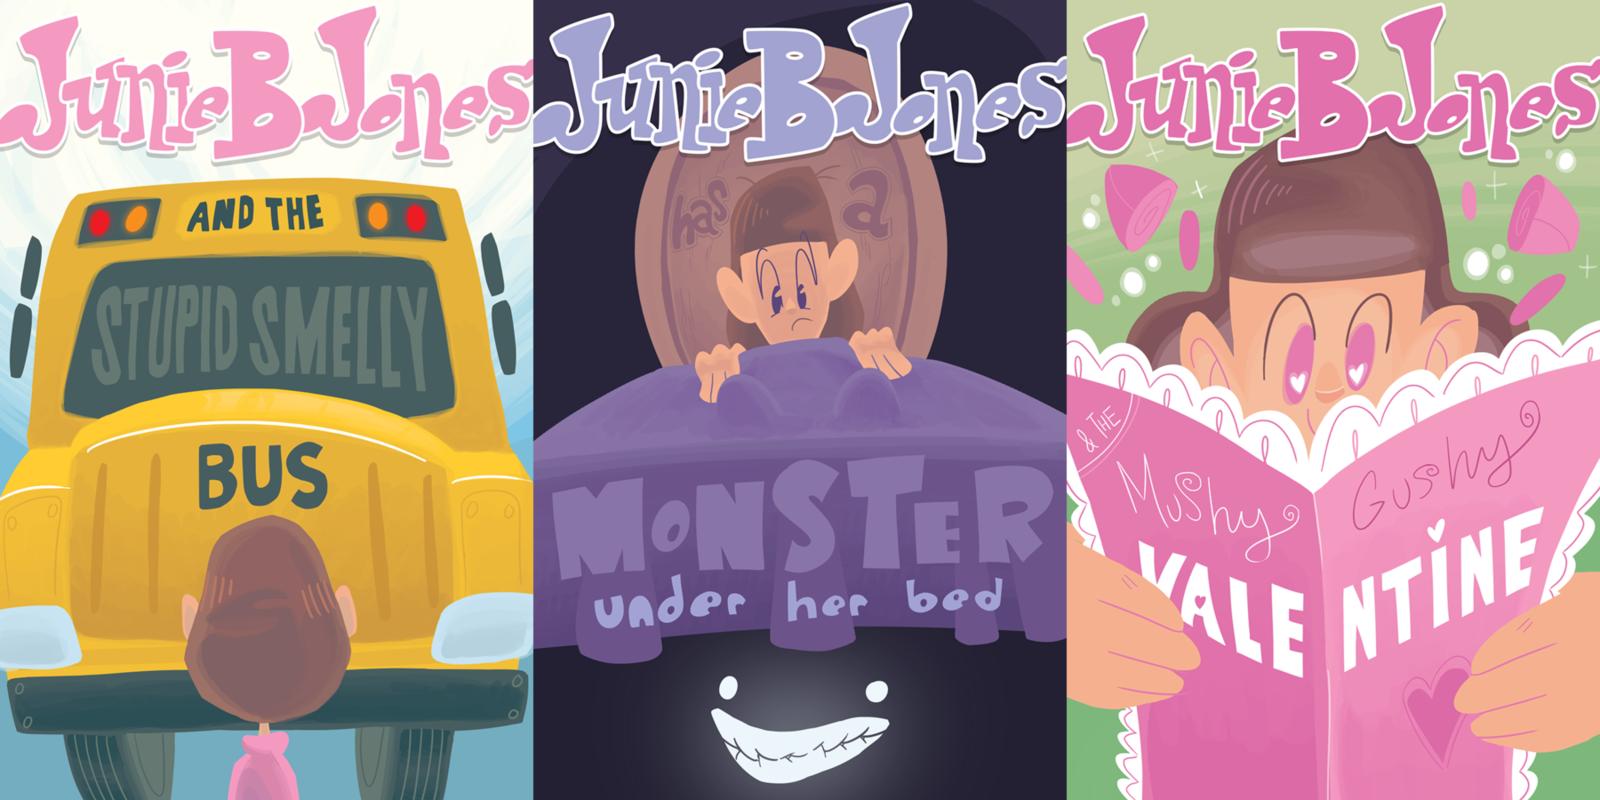 Connor Shipway - Junie B. Jones Book cover interpretation of a childrens series.